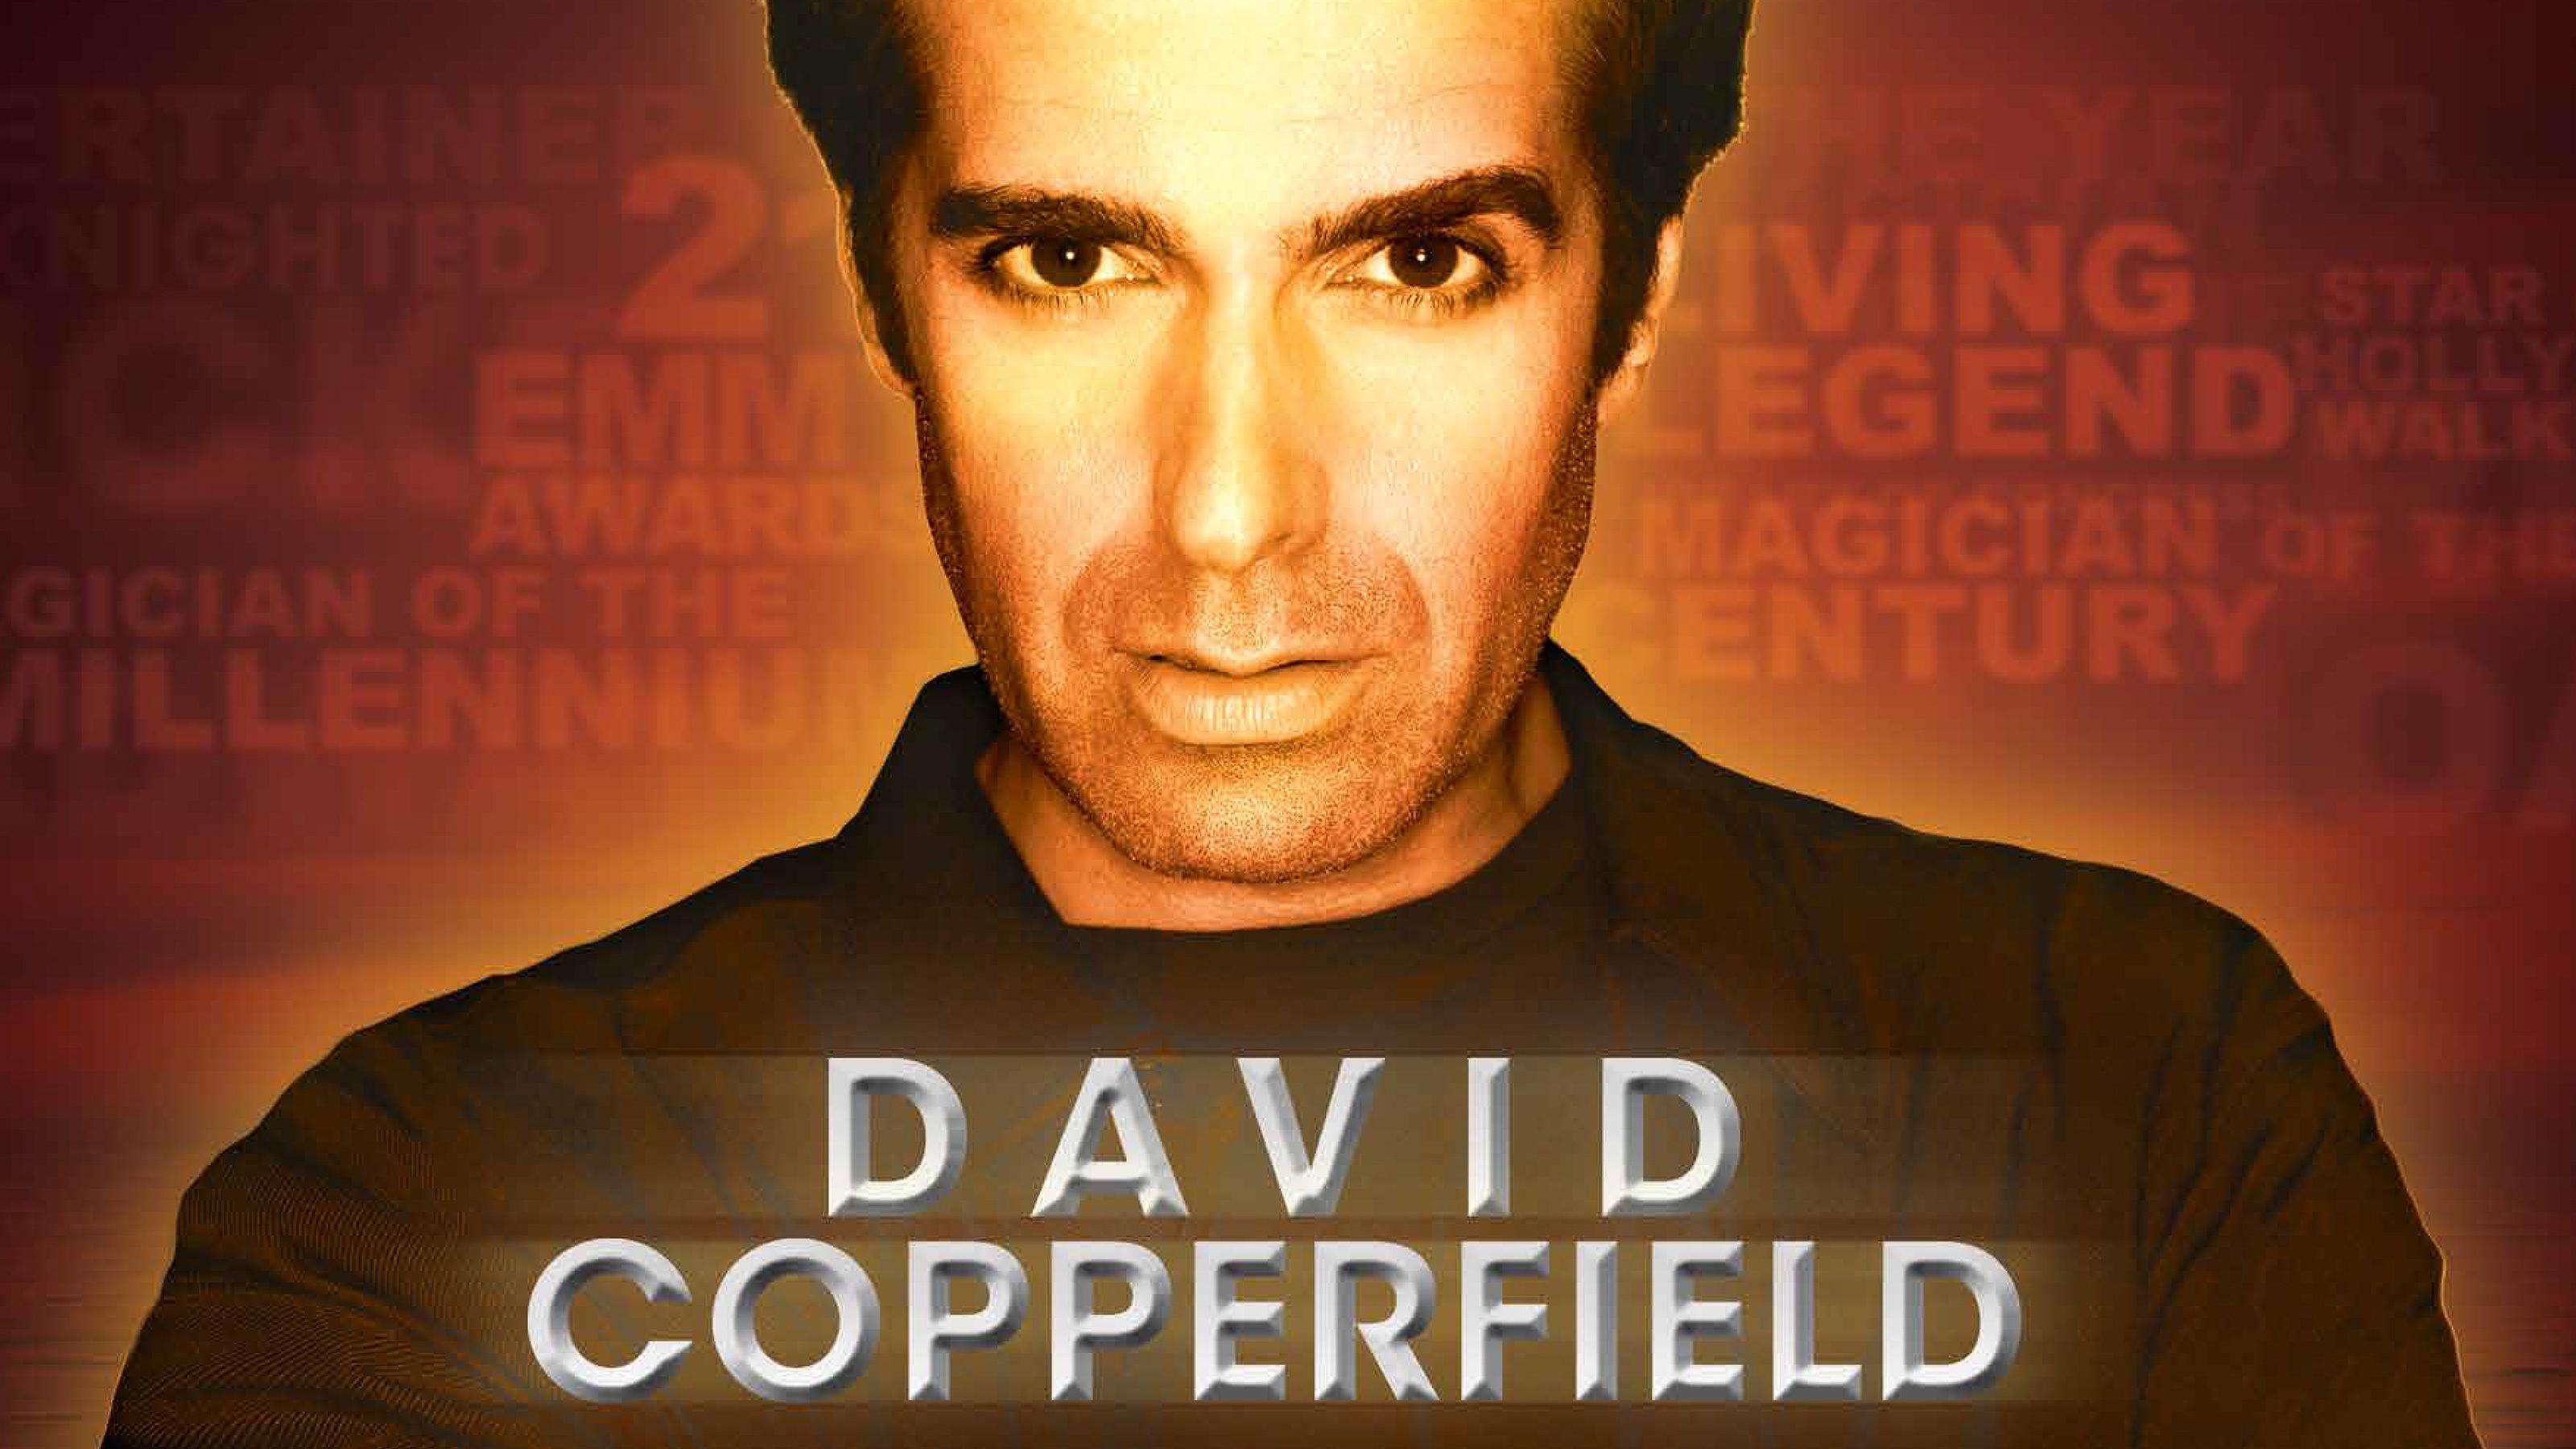 David Copperfield Magical Show in Las Vegas